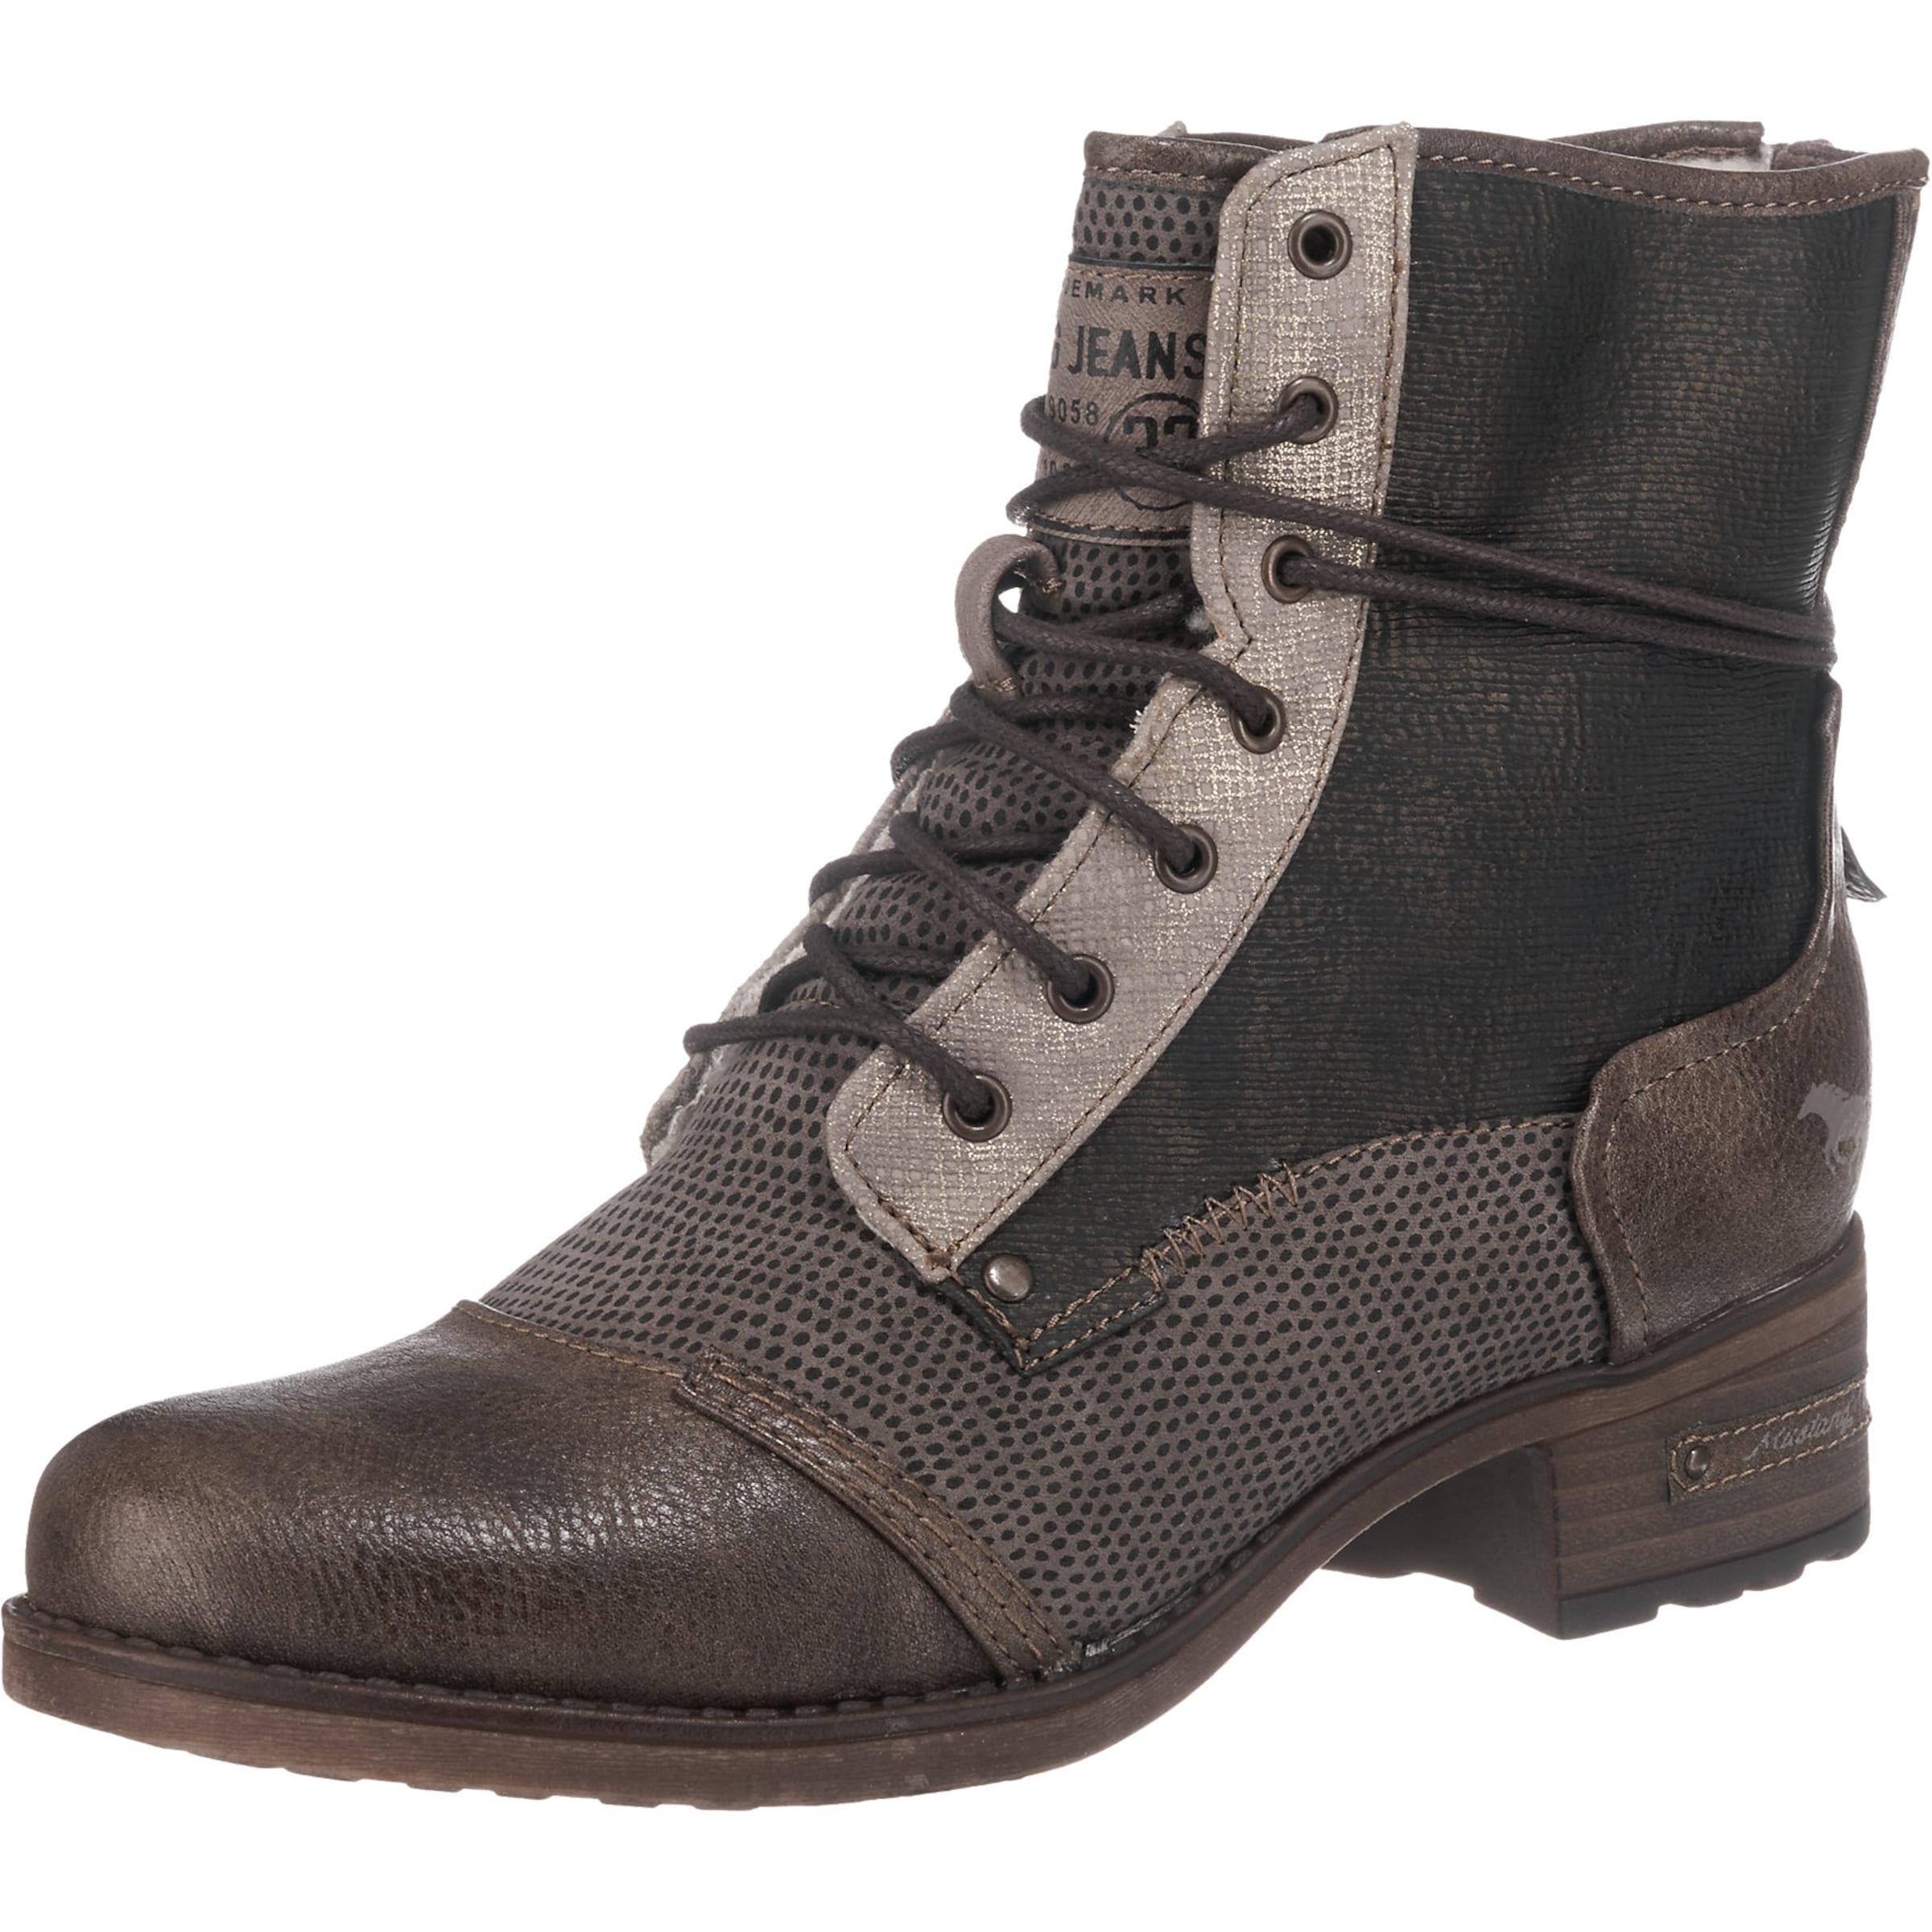 MUSTANG Shoes Schnürboots Verschleißfeste billige Schuhe